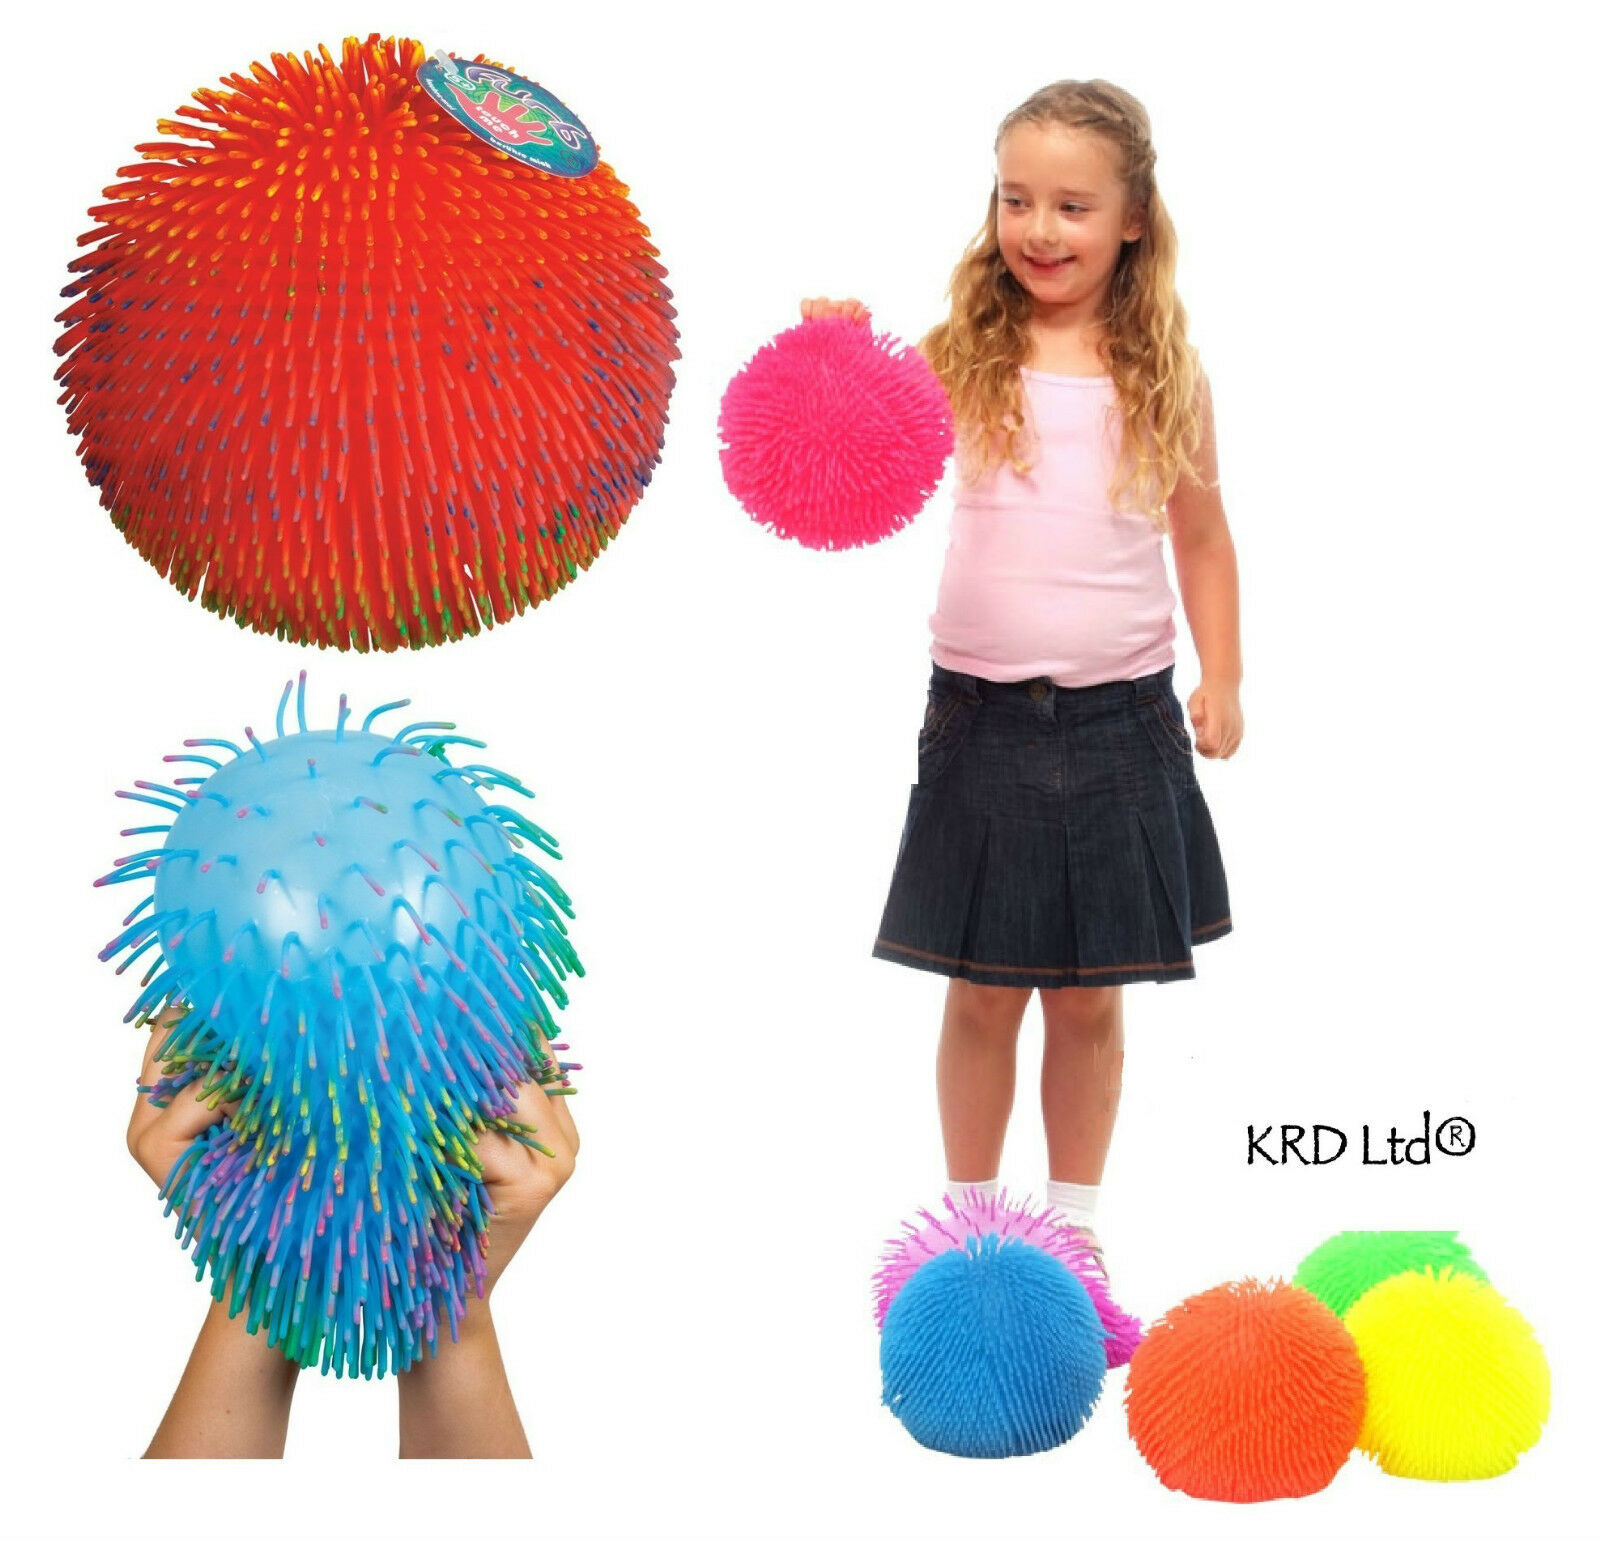 Puffer Ball Toys : Large puffer ball furb squashy tactile sensory autism